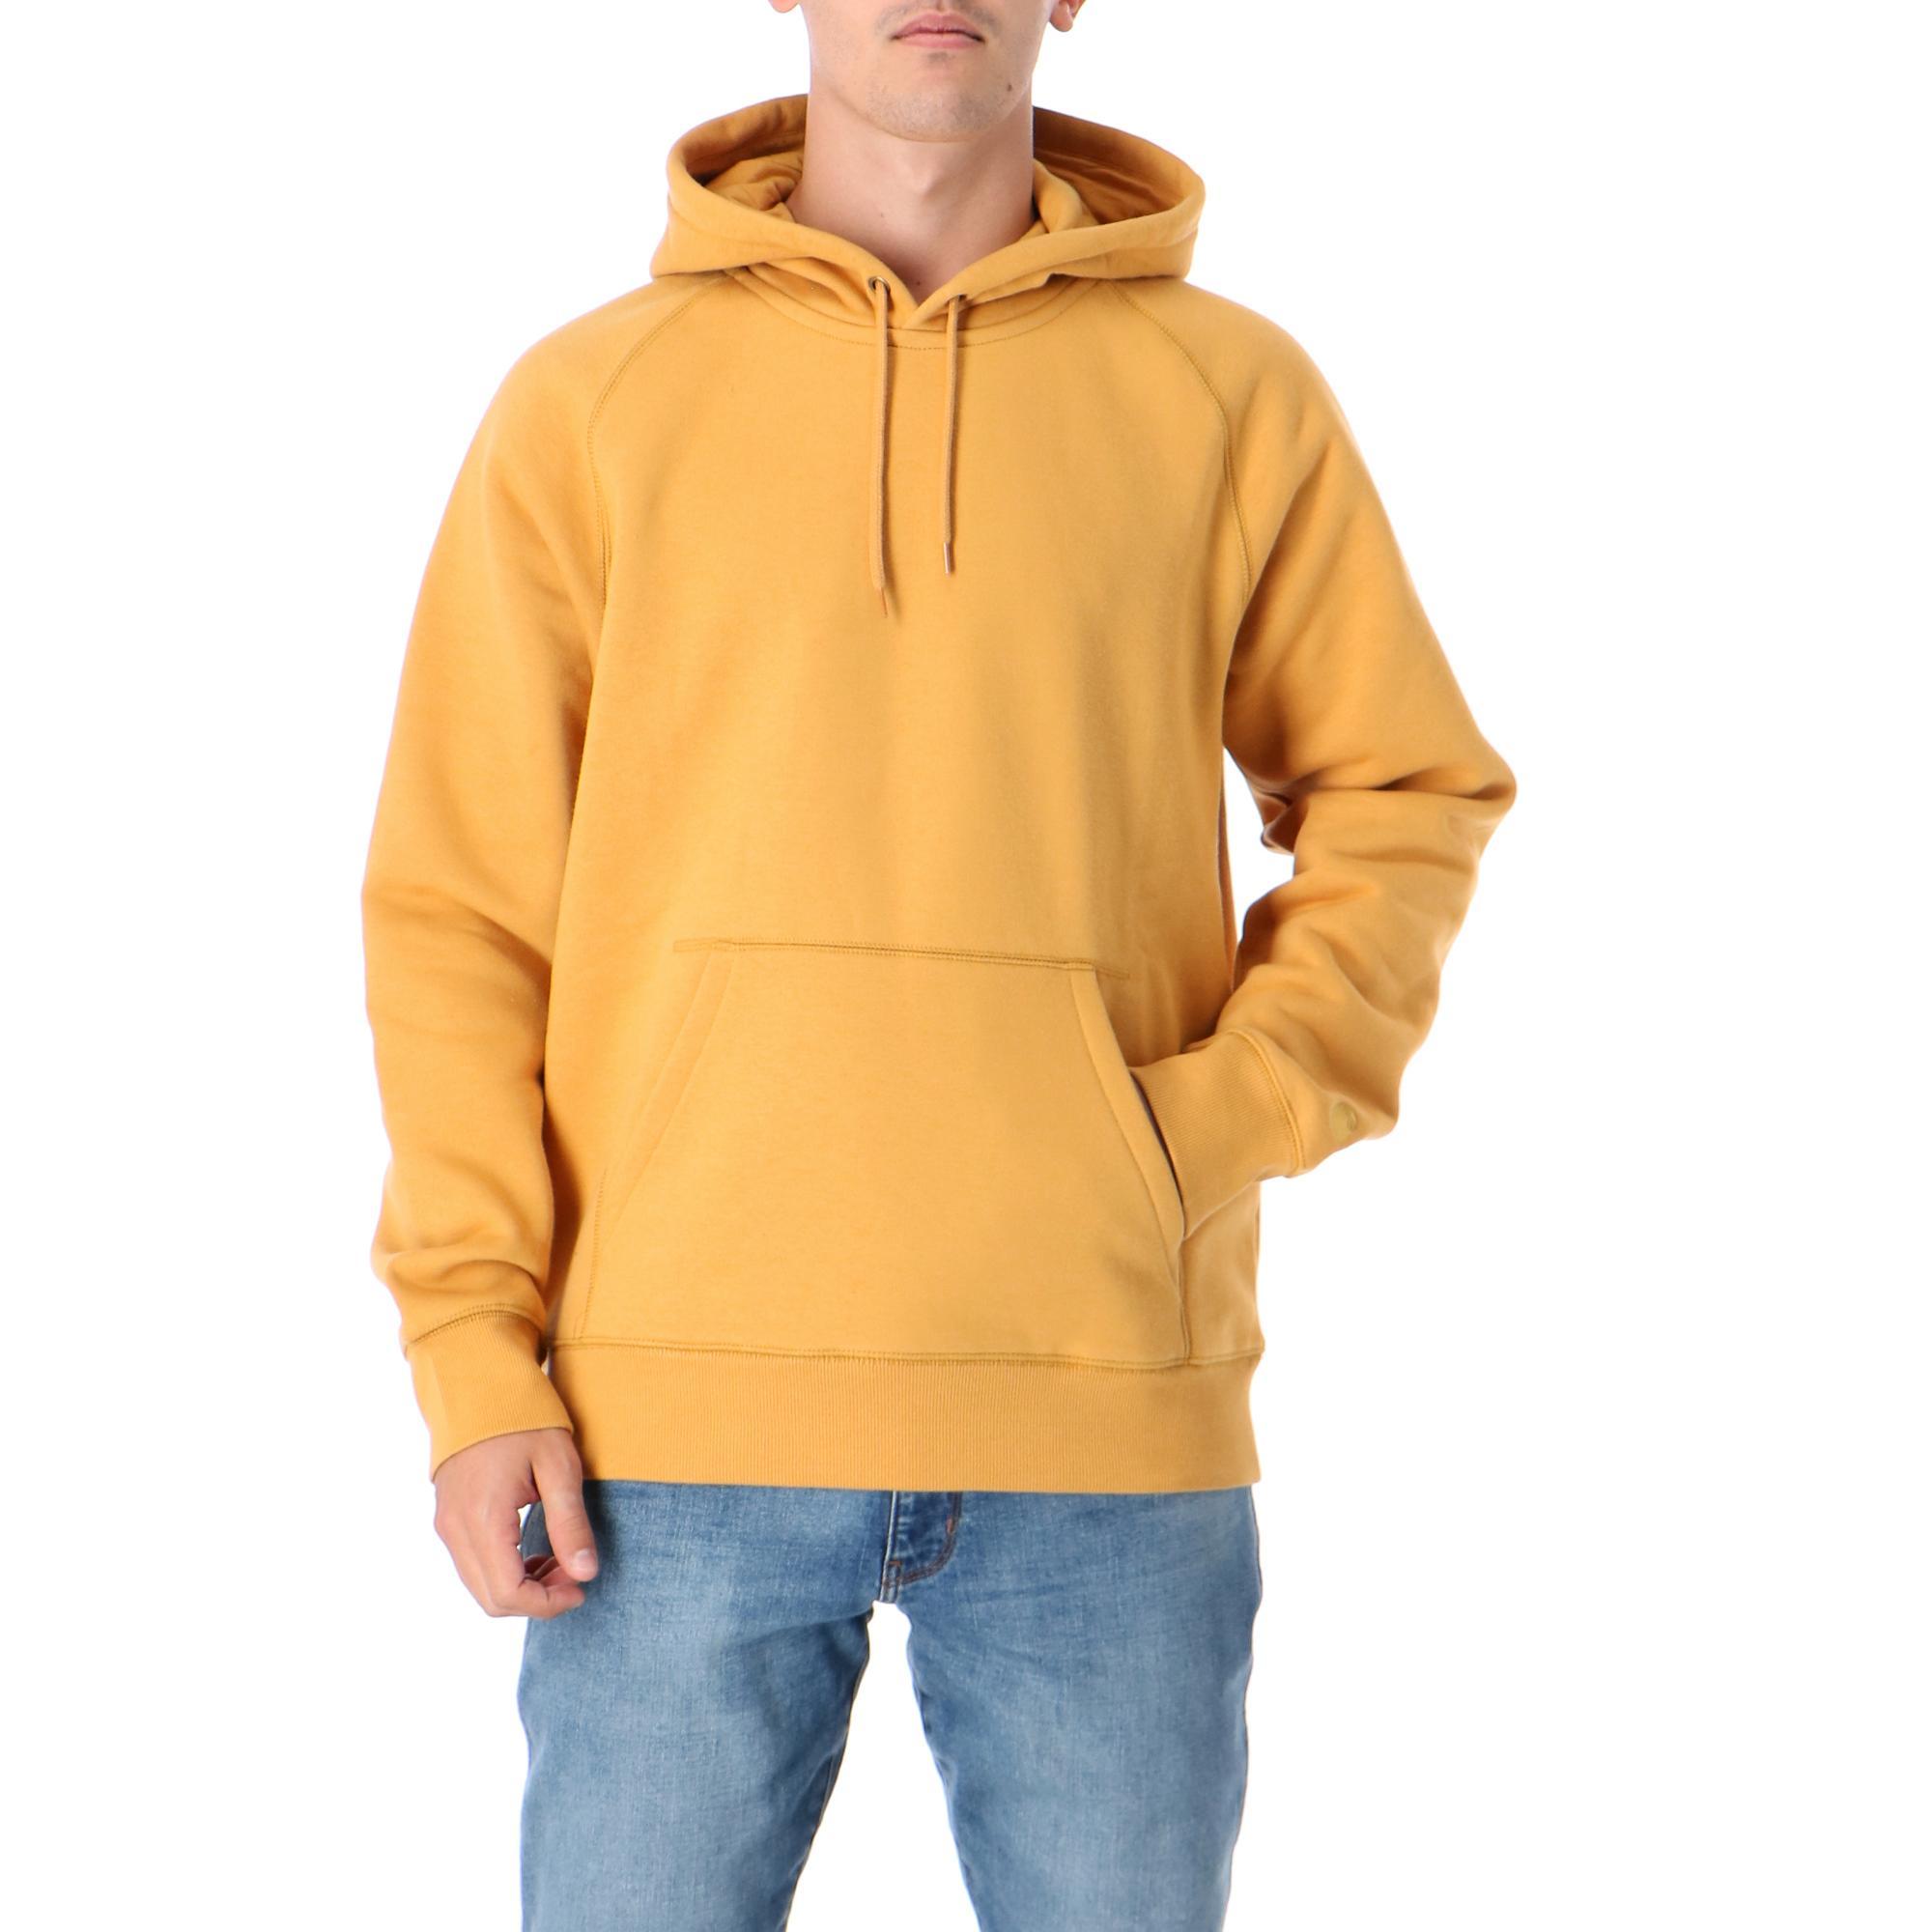 Carhartt Hooded Chase Sweatshirt Winter sun gold